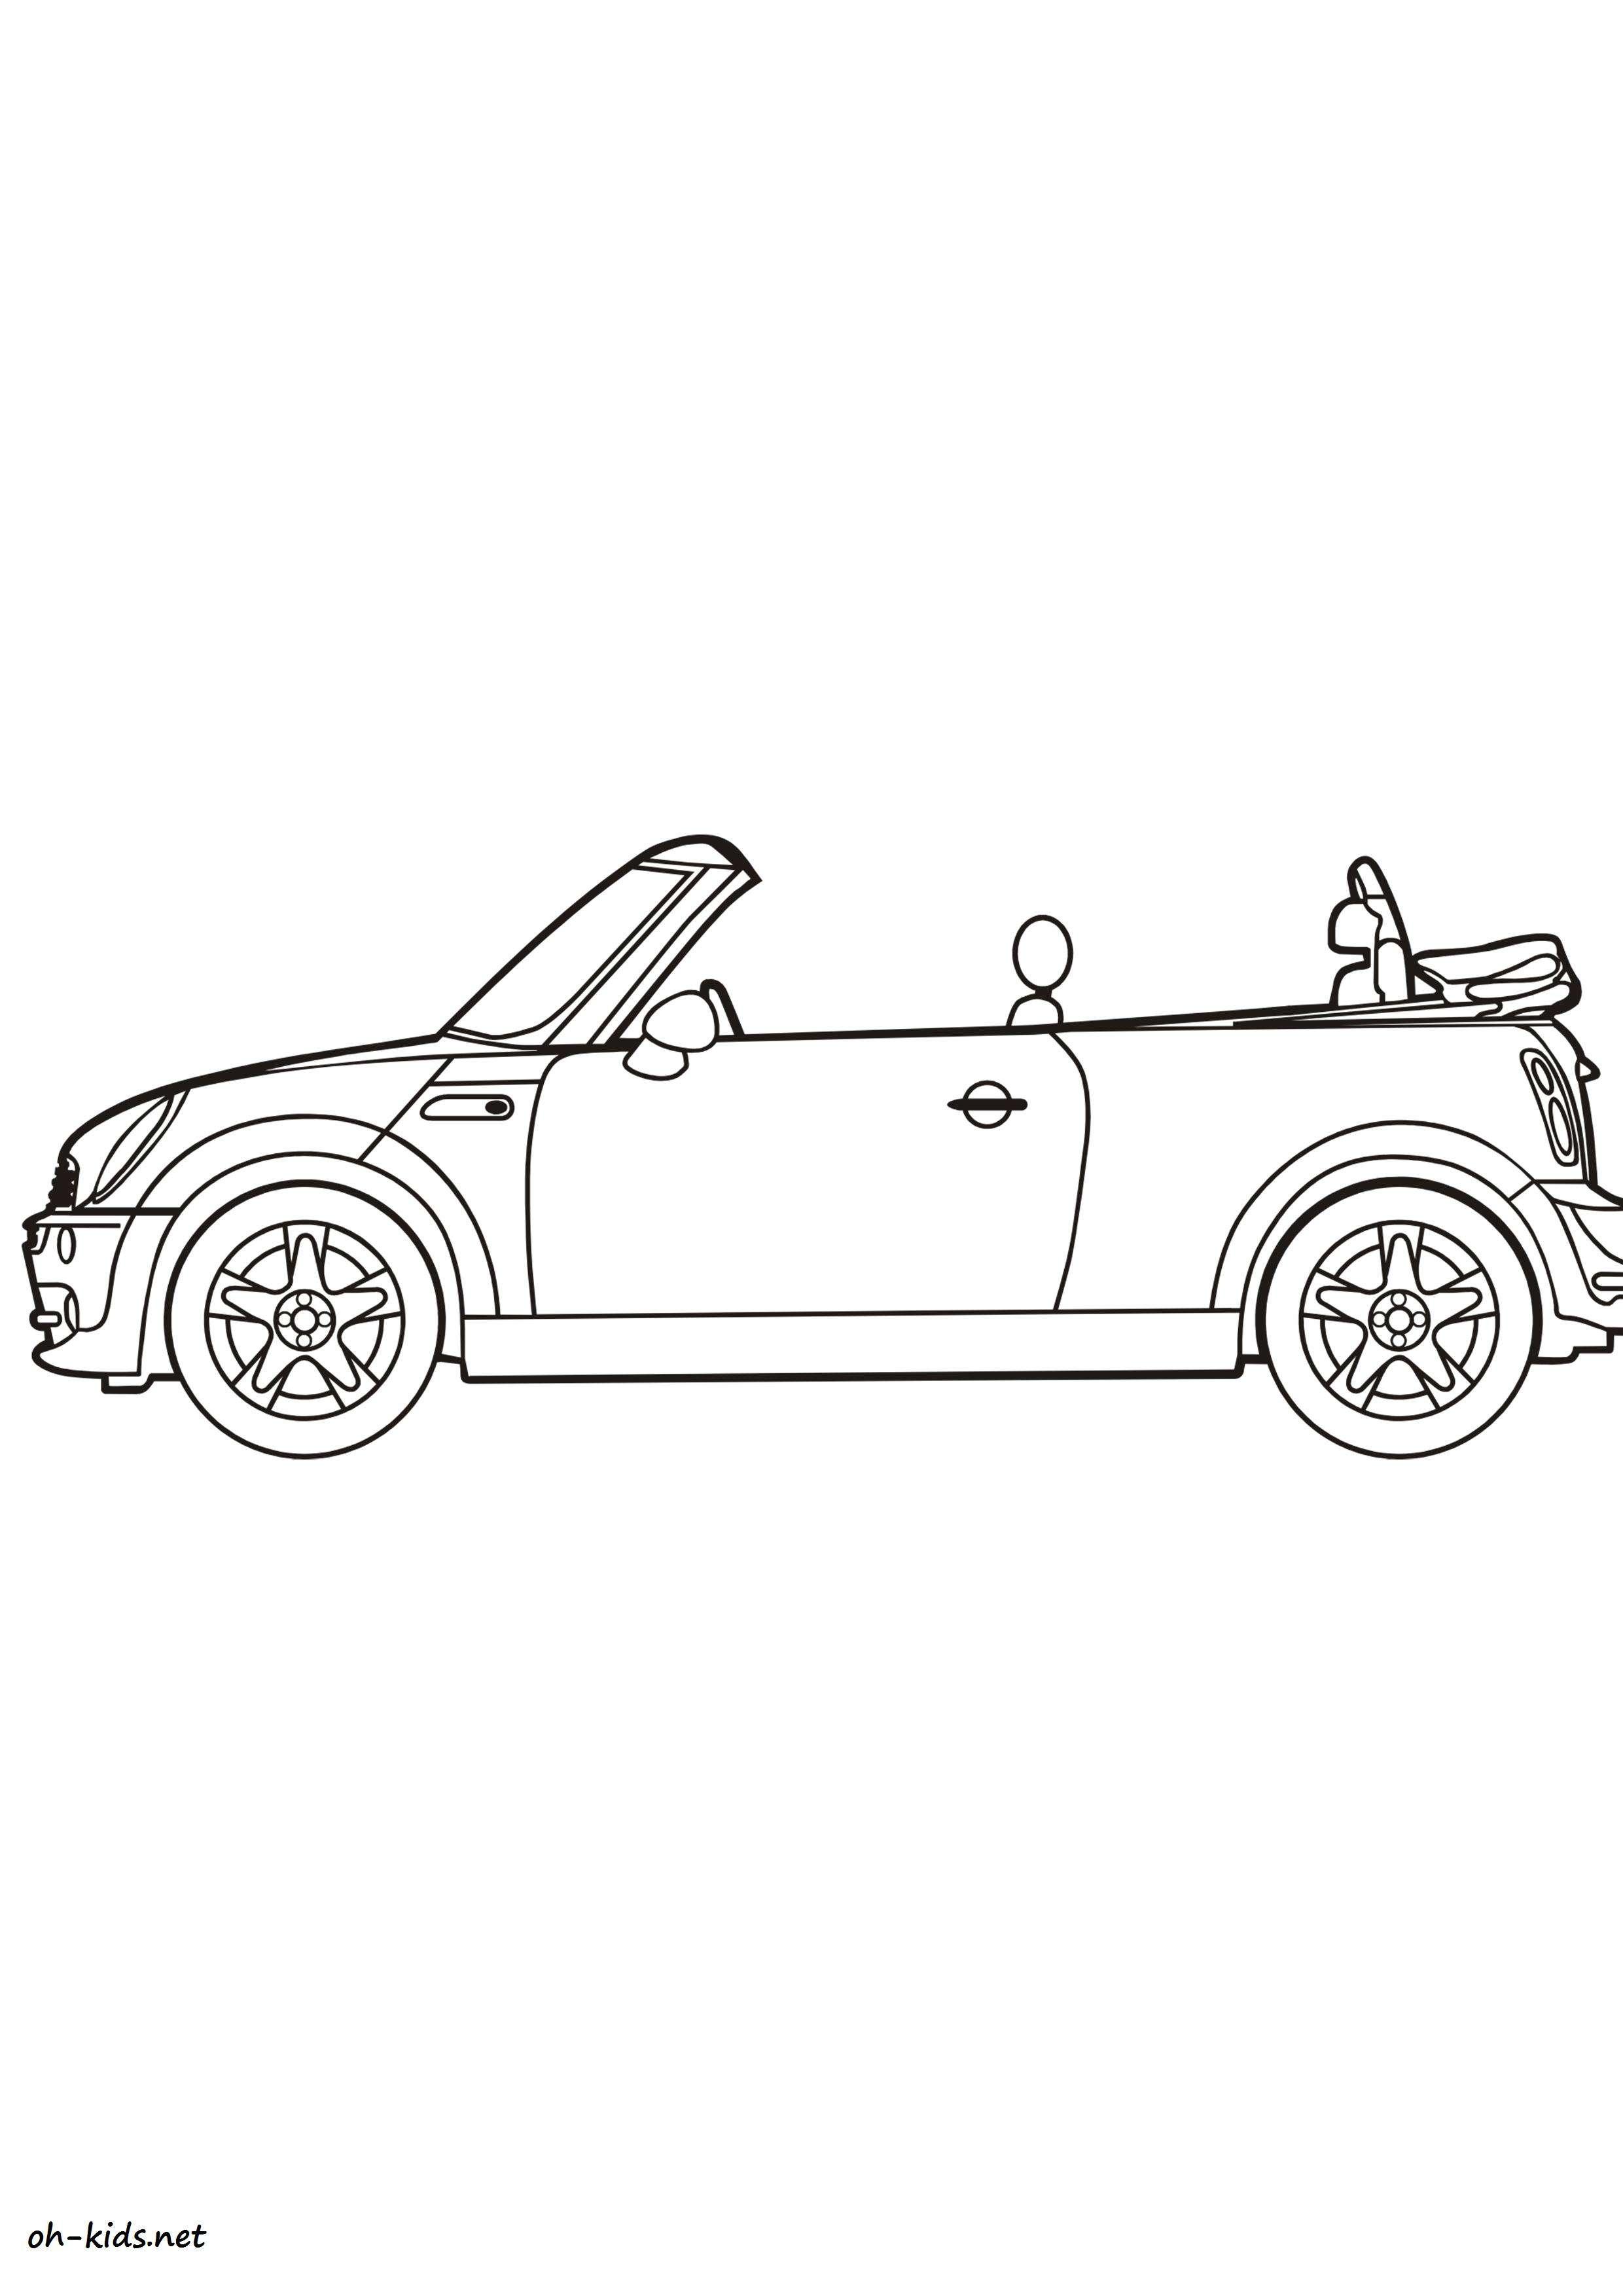 Dessin de automobile - Dessin #1434